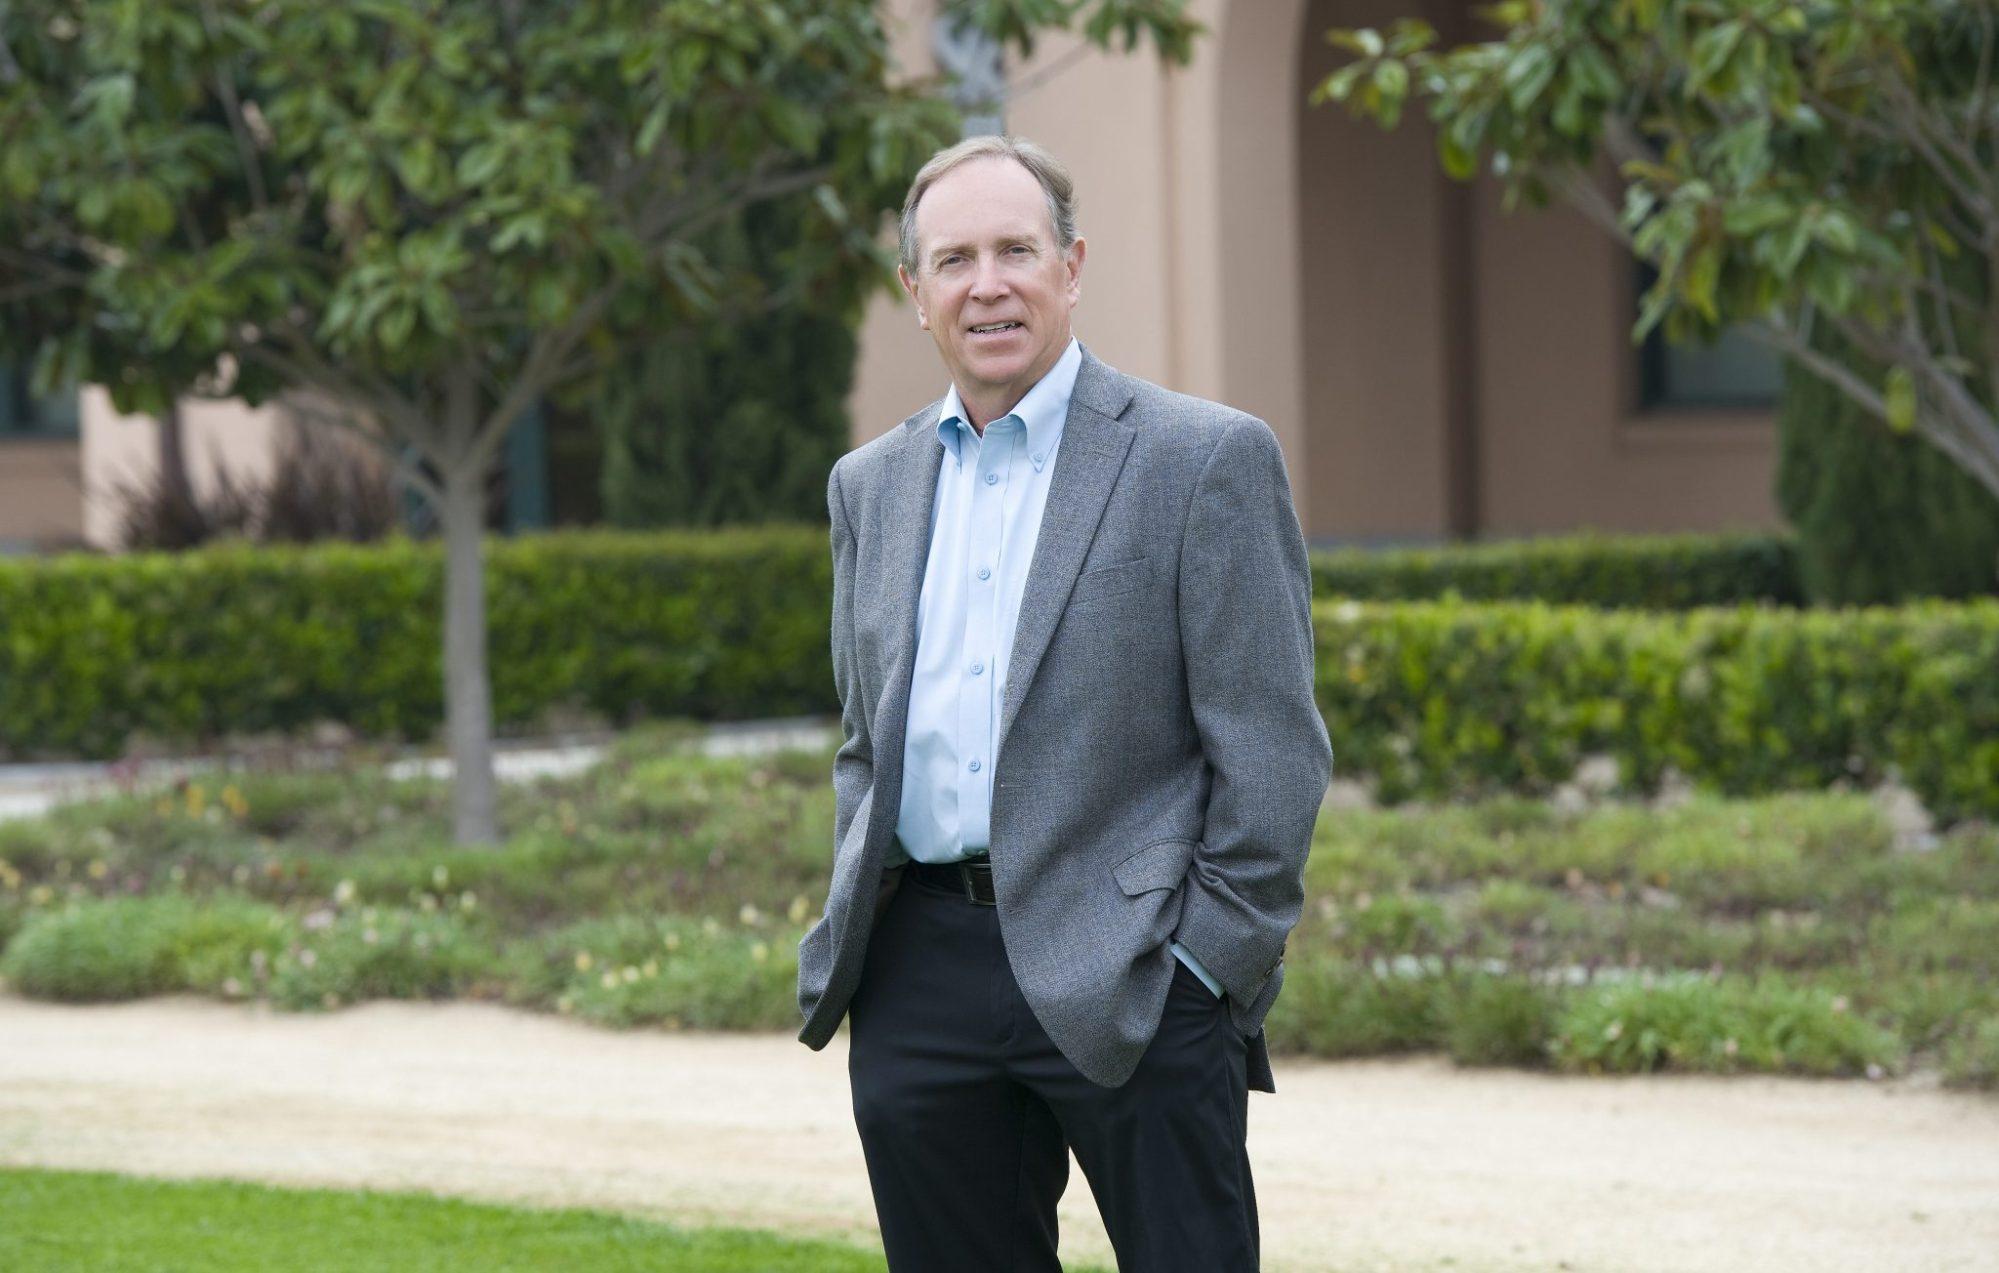 SDSCF Founder, CEO & President Bob Kelly